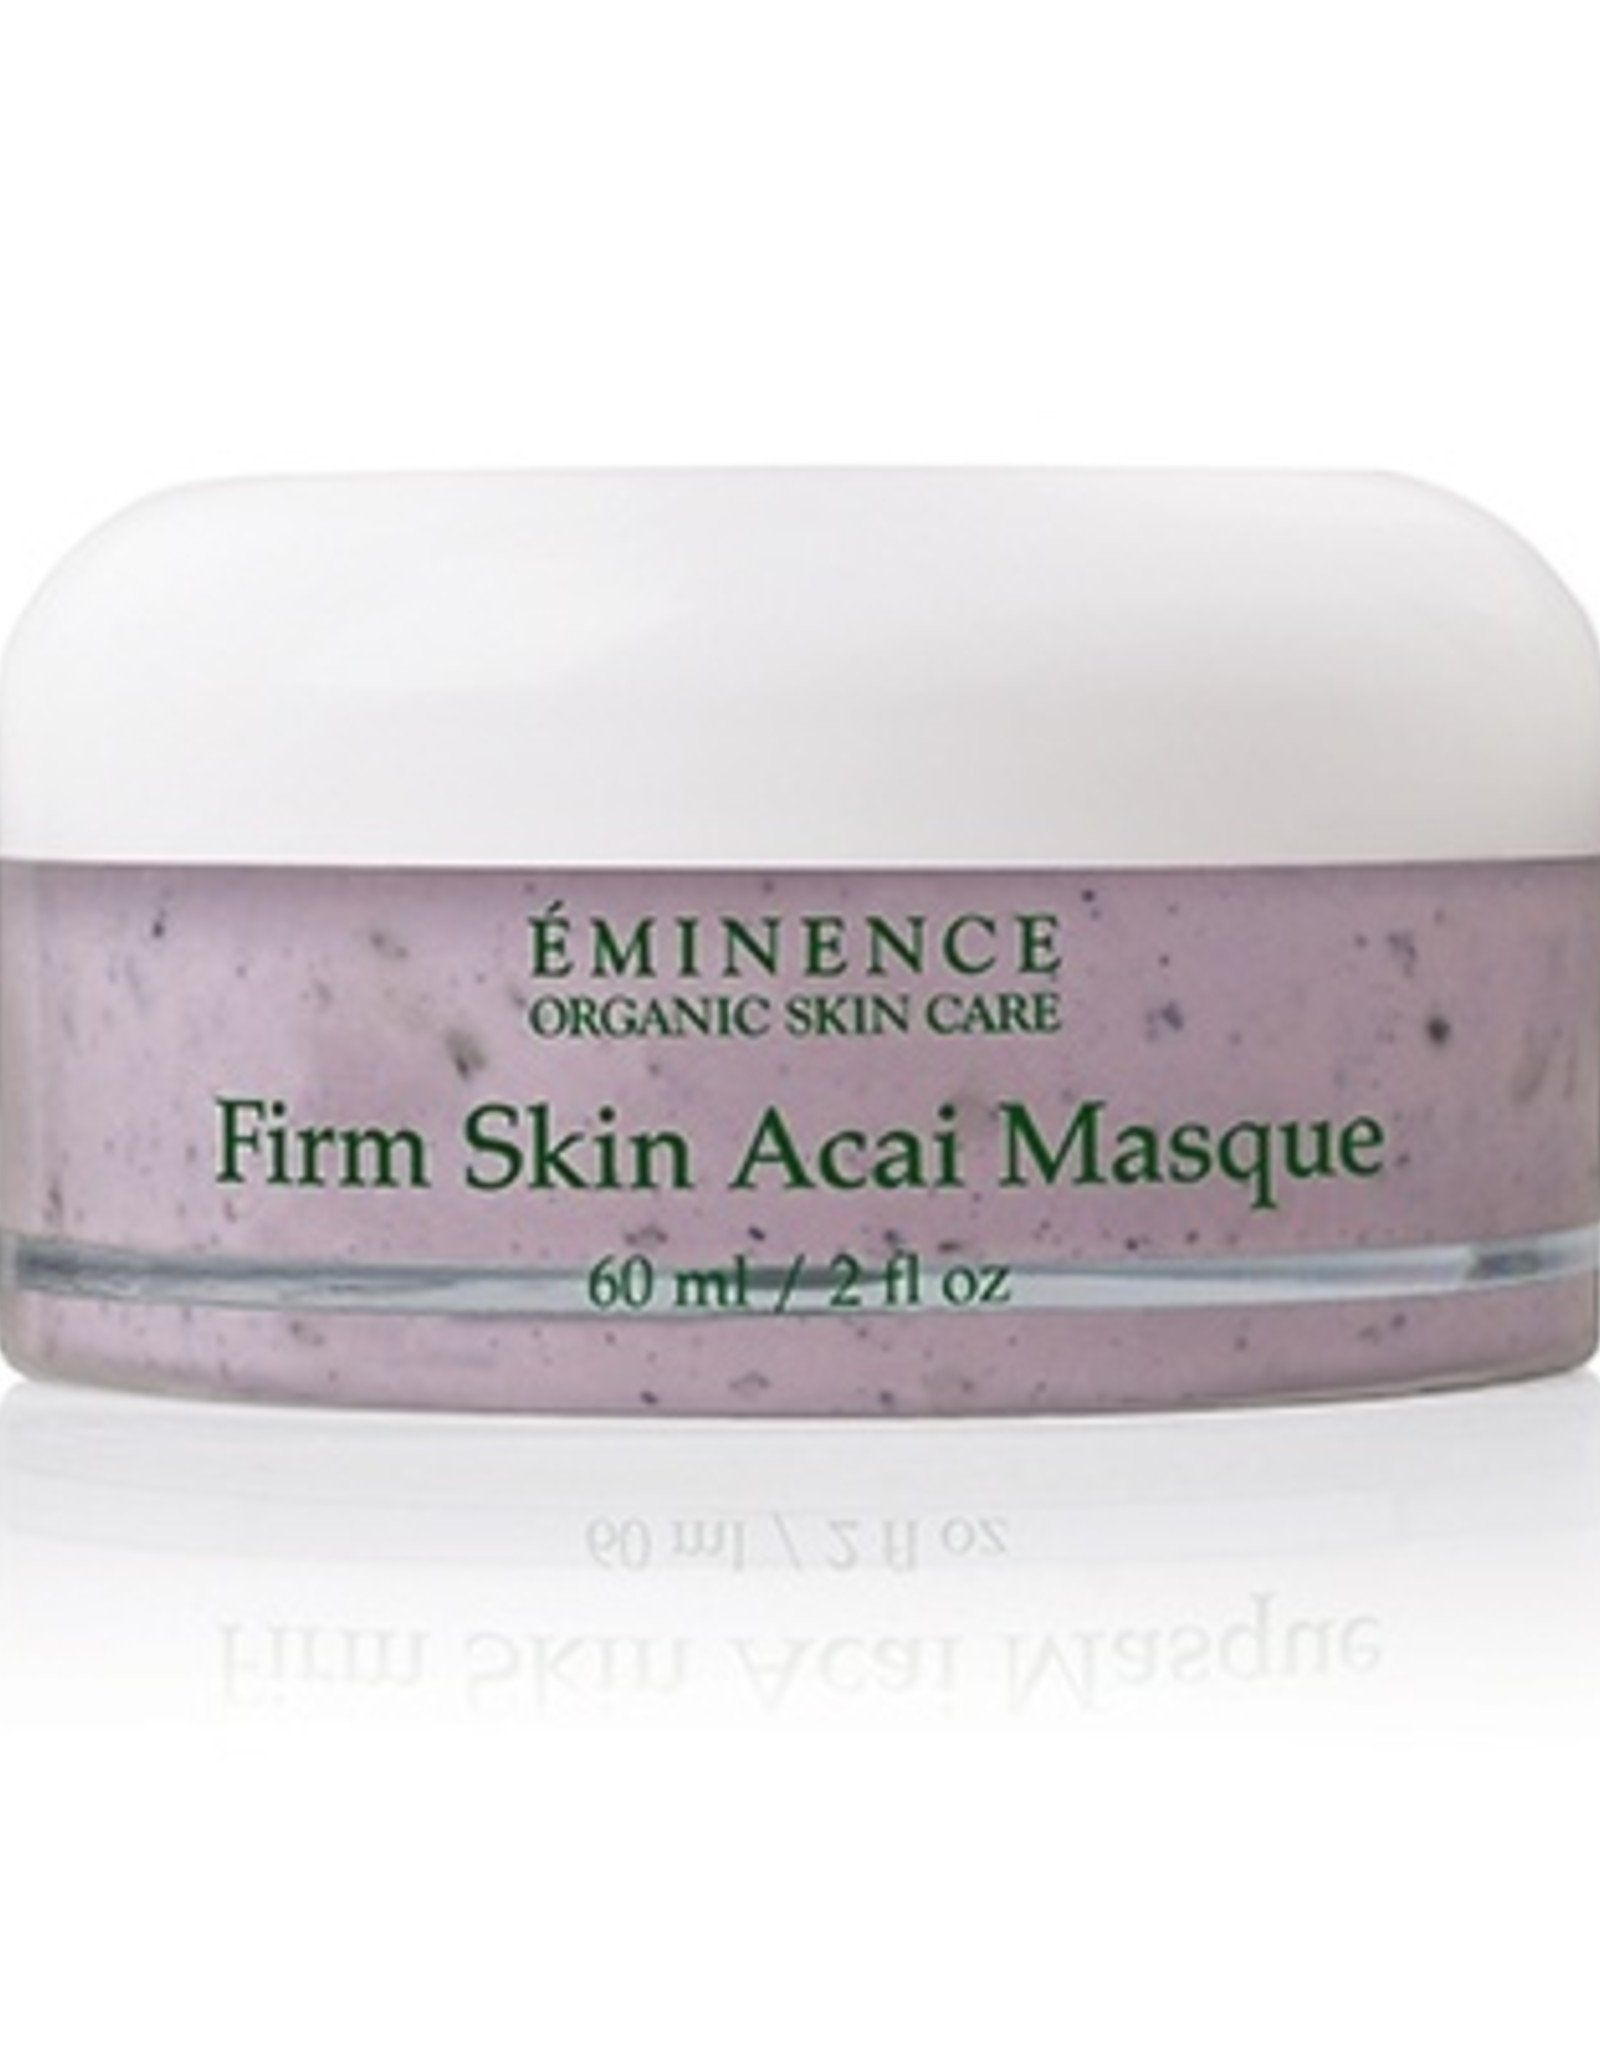 Eminence Organic Skin Care Firm Skin Acai Masque